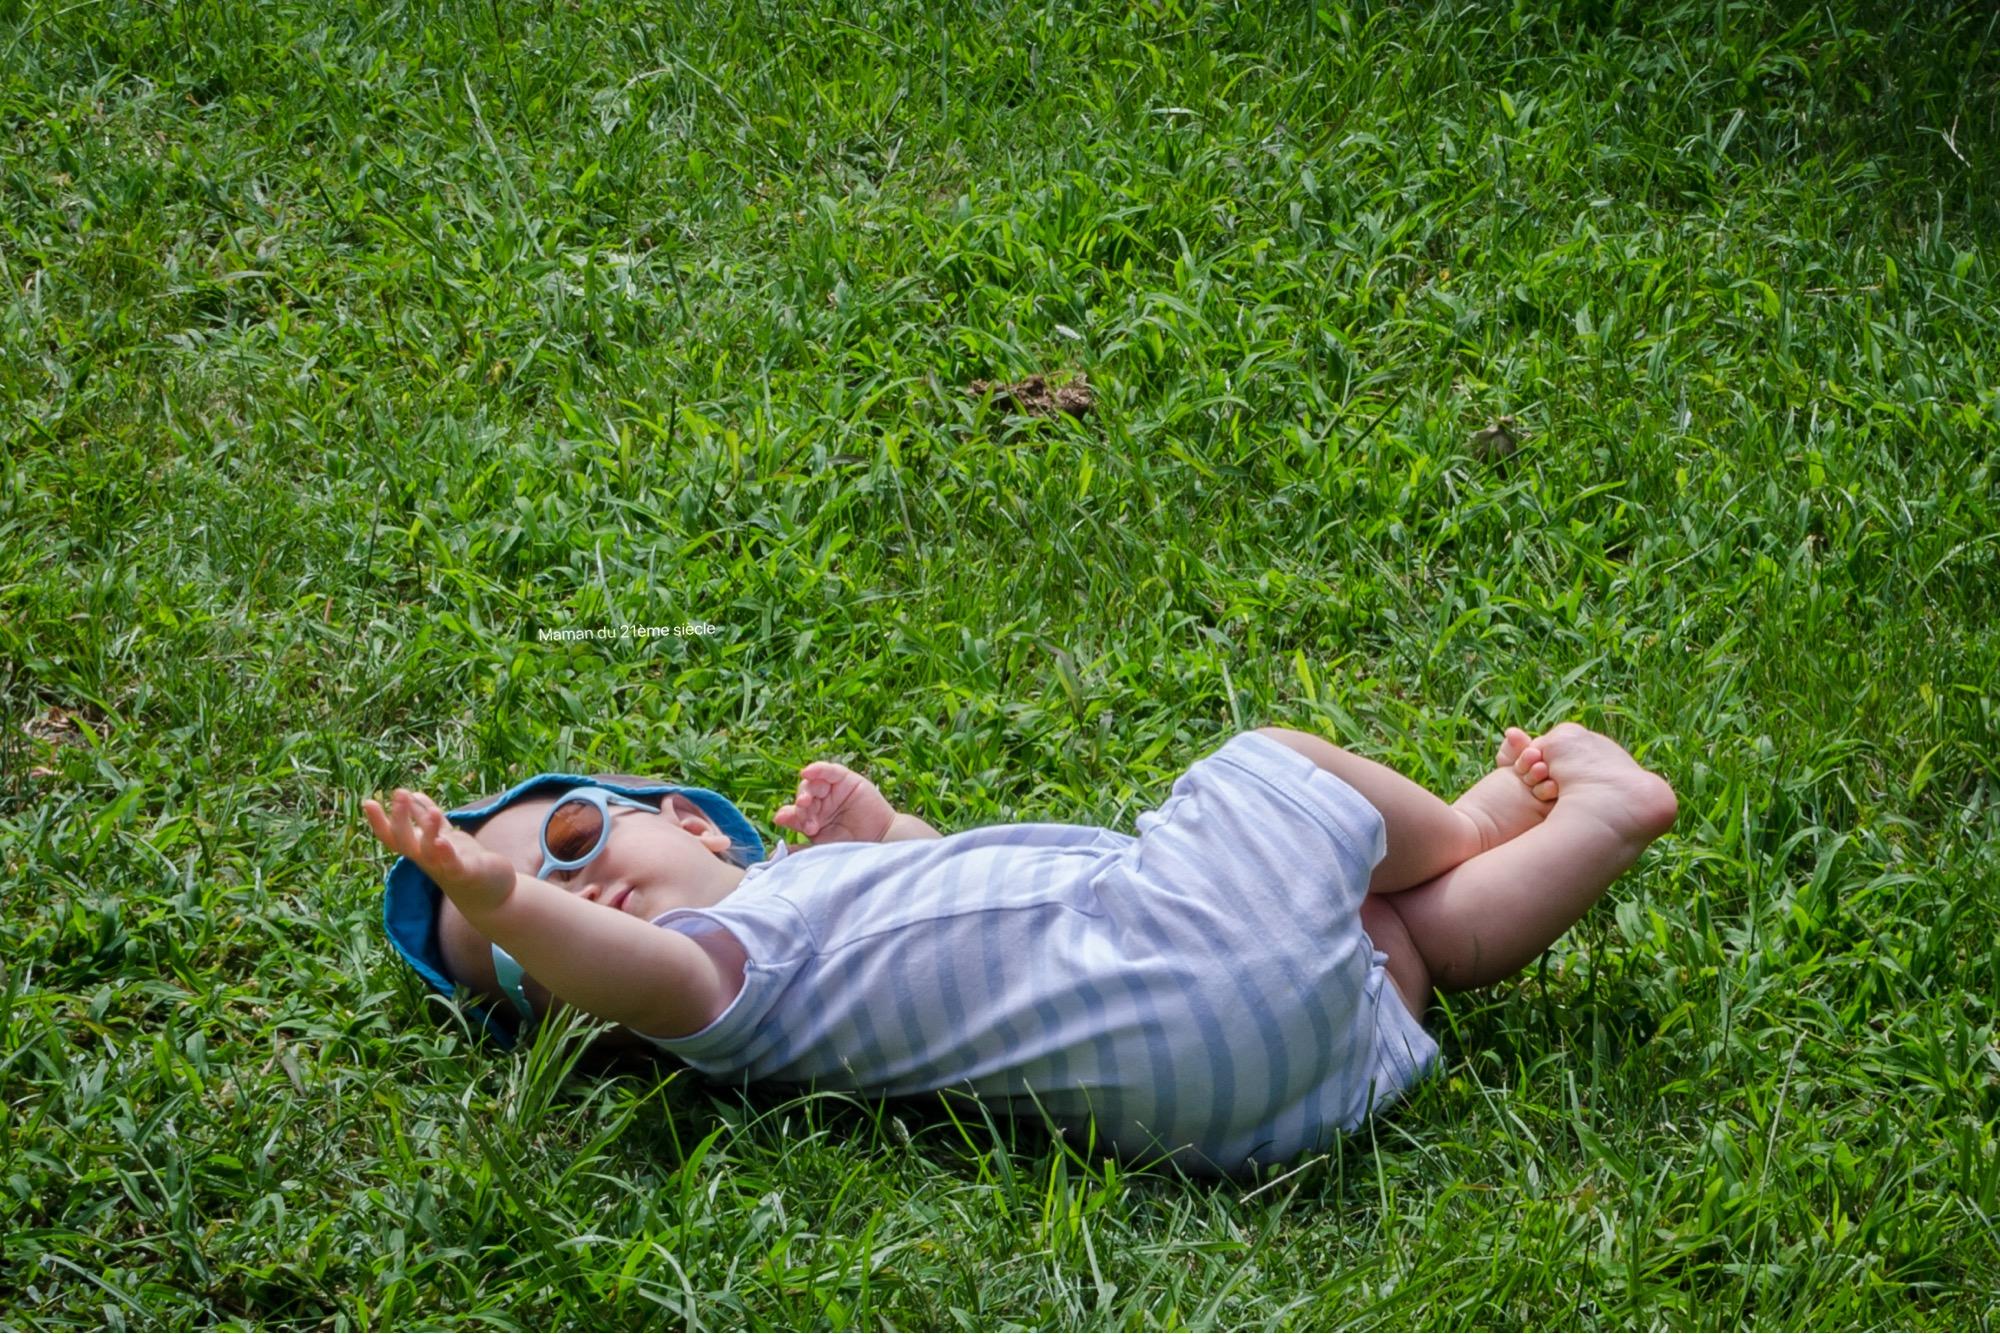 se-rouler-dans-herbe